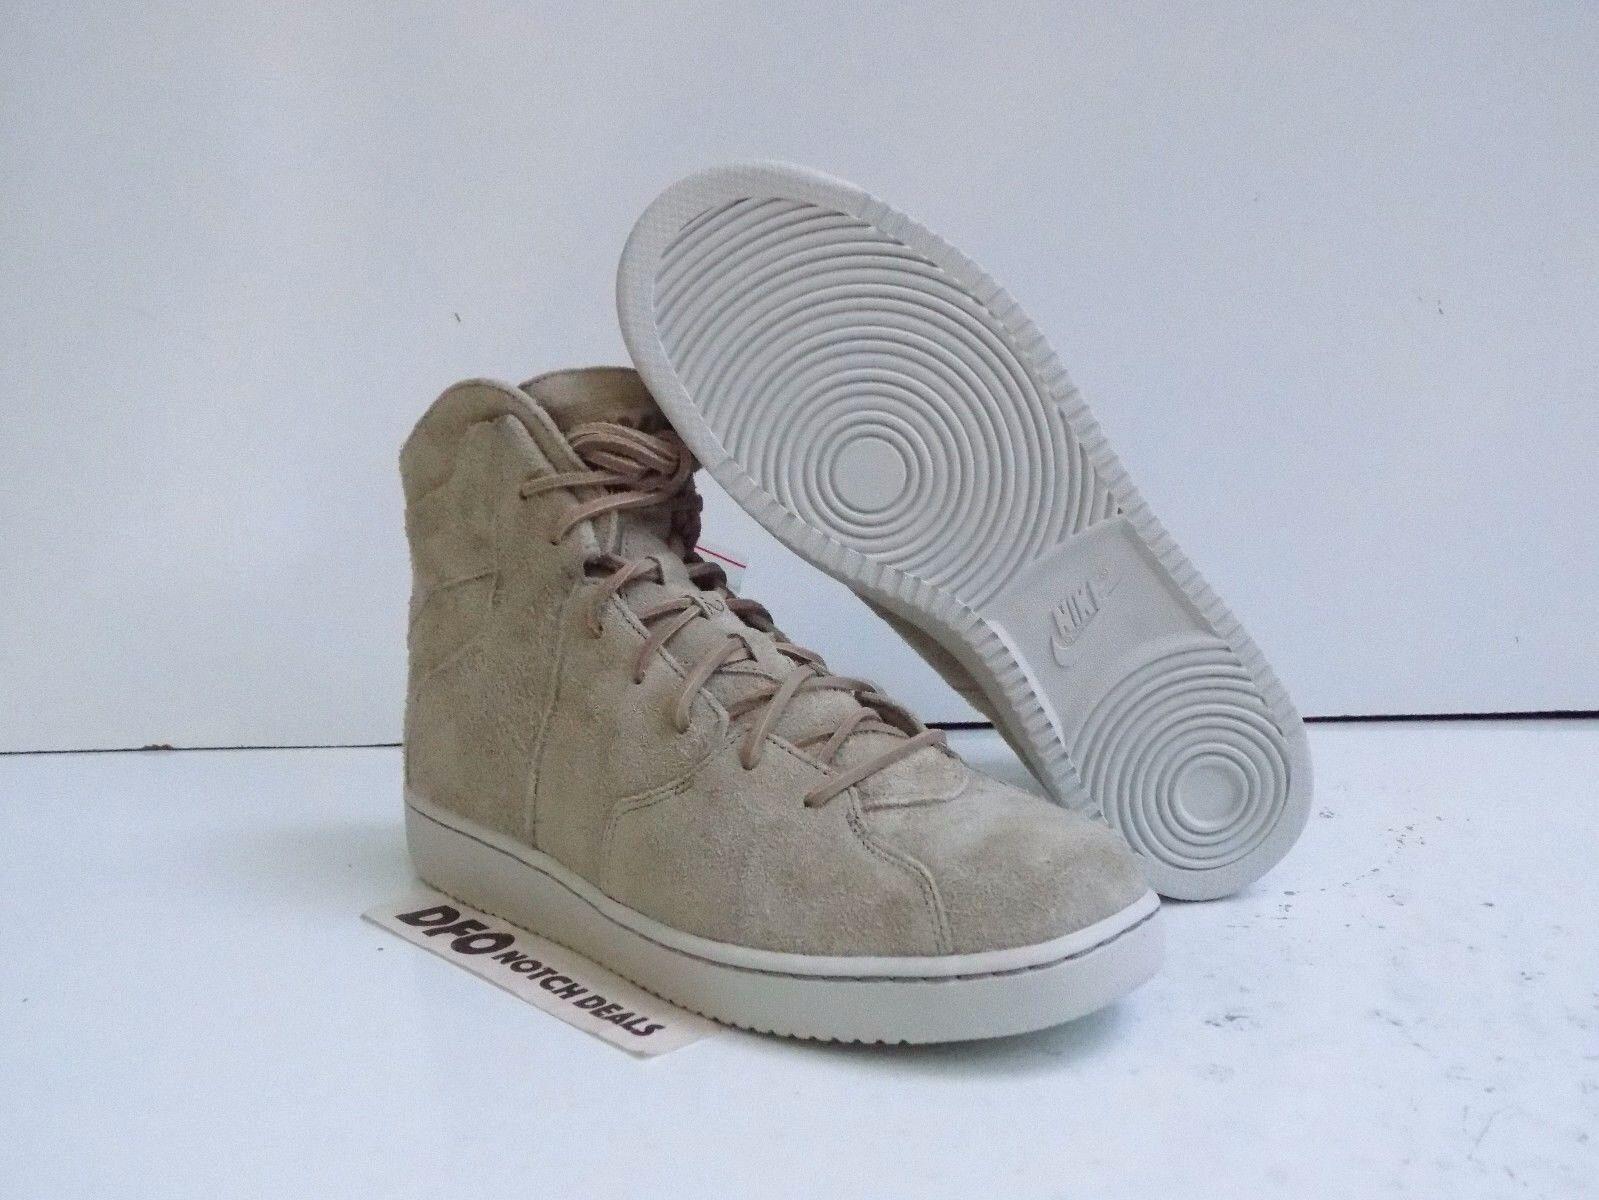 Nike Nike Nike Air Jordan Zapatos de baloncesto de Westbrook 0,2 SZ 9.5-11 nuevo Khaki 854563 209 barato y hermoso moda 46ed94